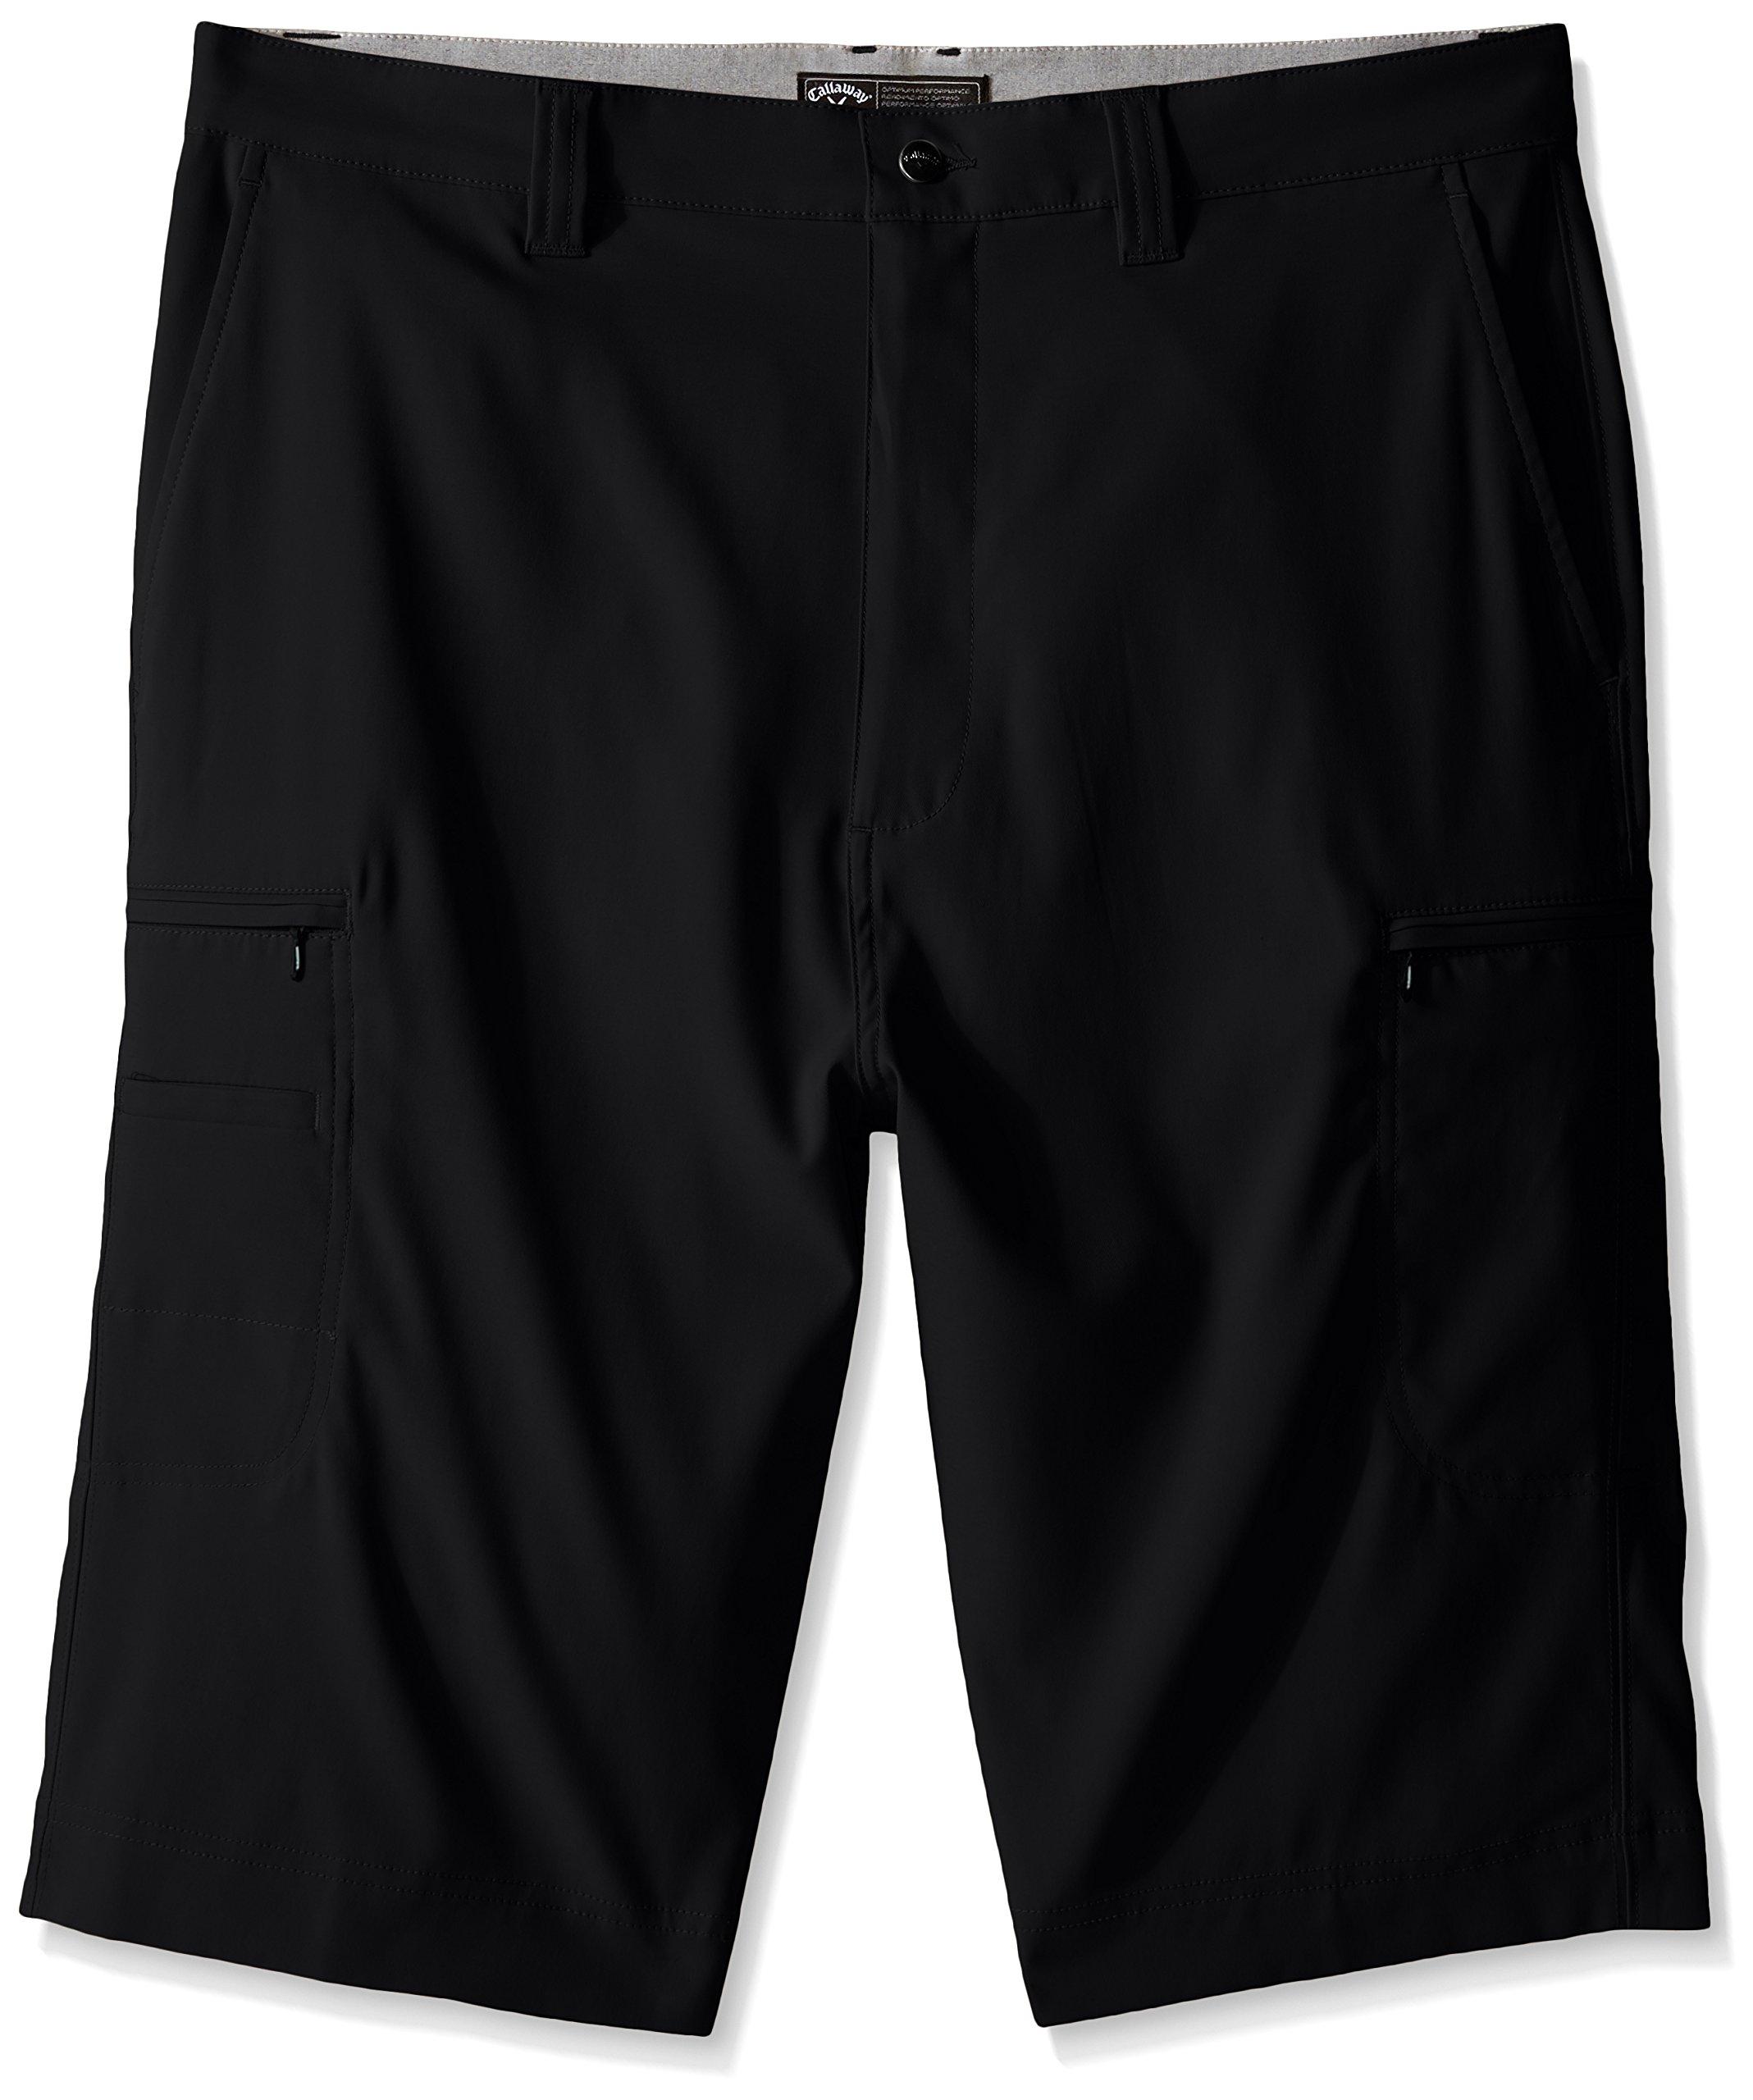 Callaway Men's Big & Tall Golf Performance Flat Front Cargo Shorts, Caviar, 42 Big